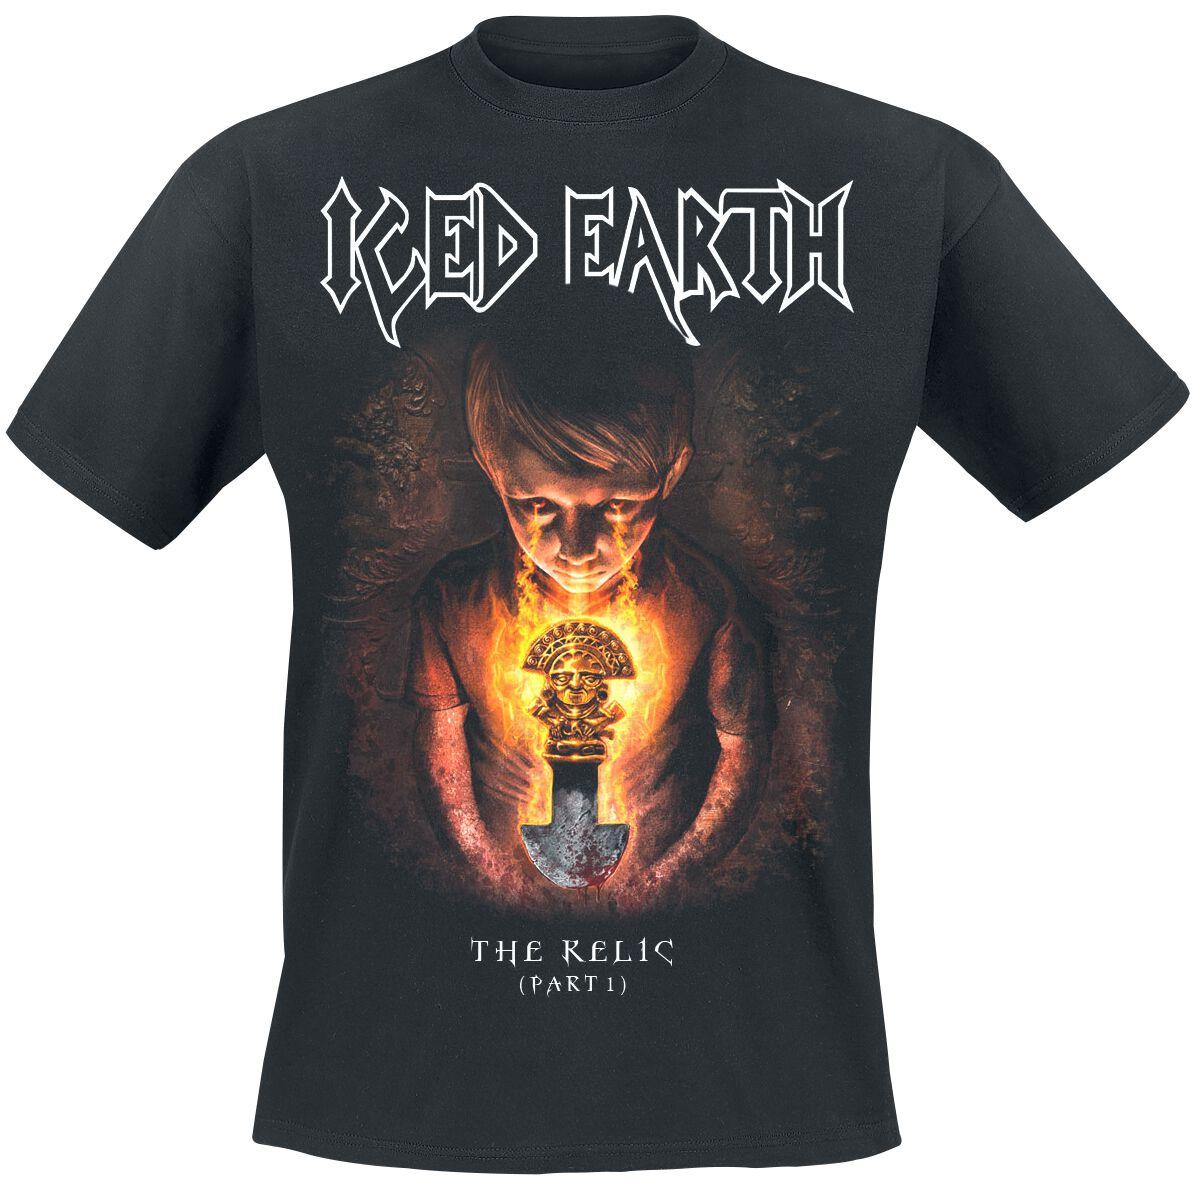 Zespoły - Koszulki - T-Shirt Iced Earth The Relic T-Shirt czarny - 362069